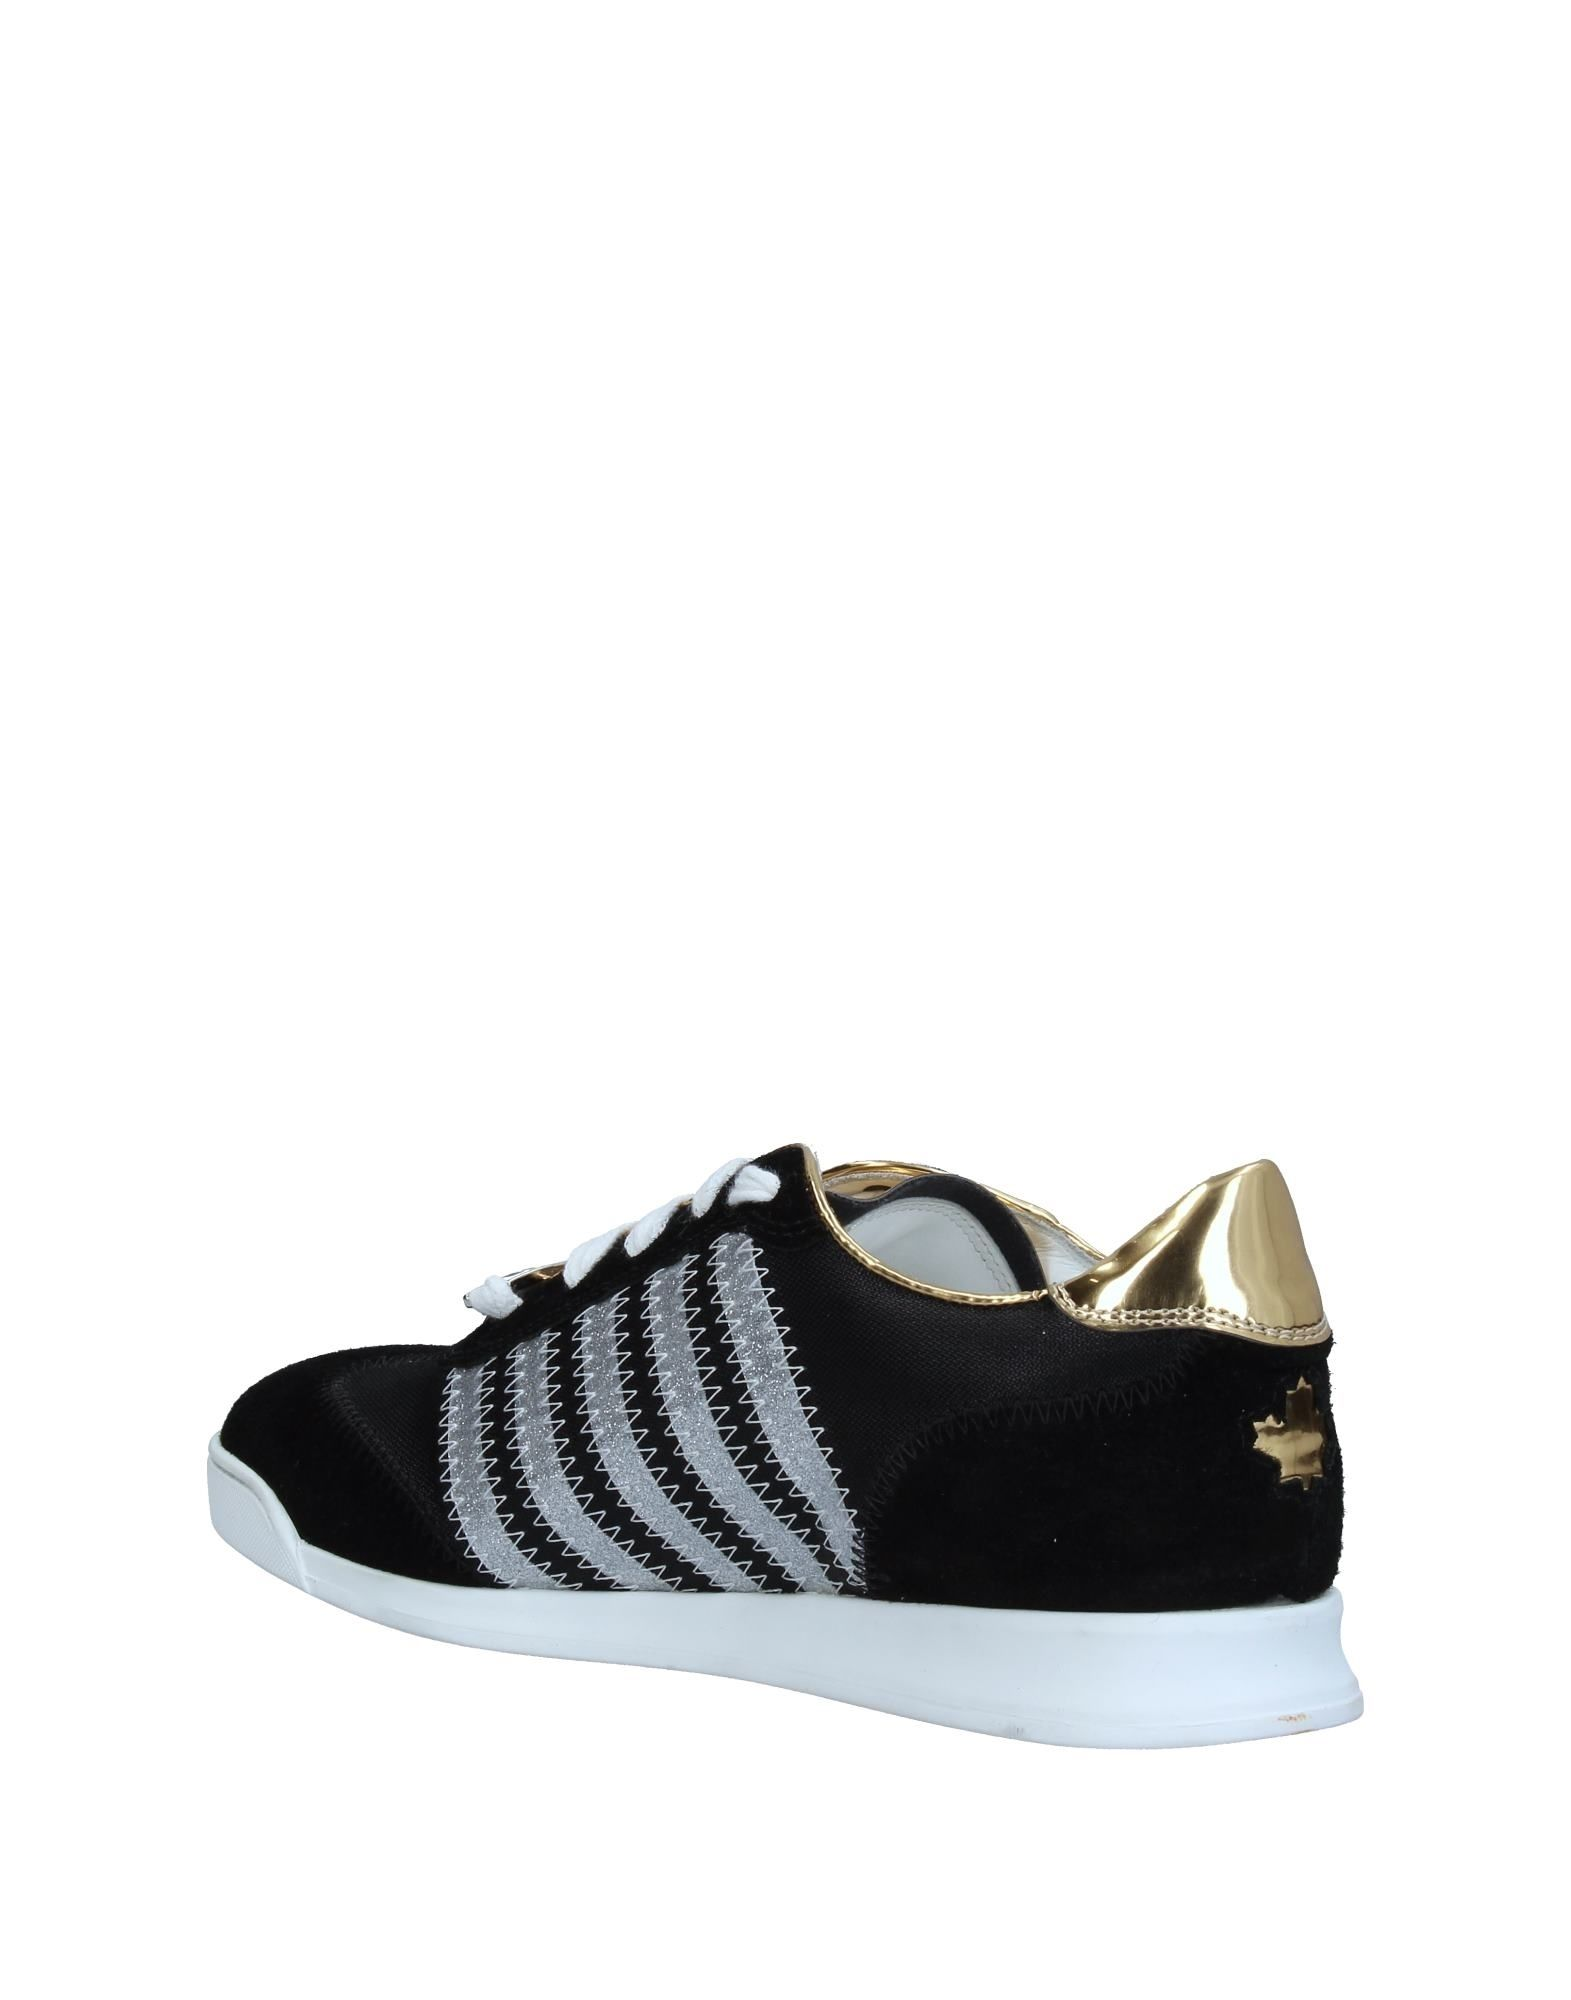 Rabatt Schuhe DsquaROT2 Damen Sneakers Damen DsquaROT2  11363174SG 4190c8